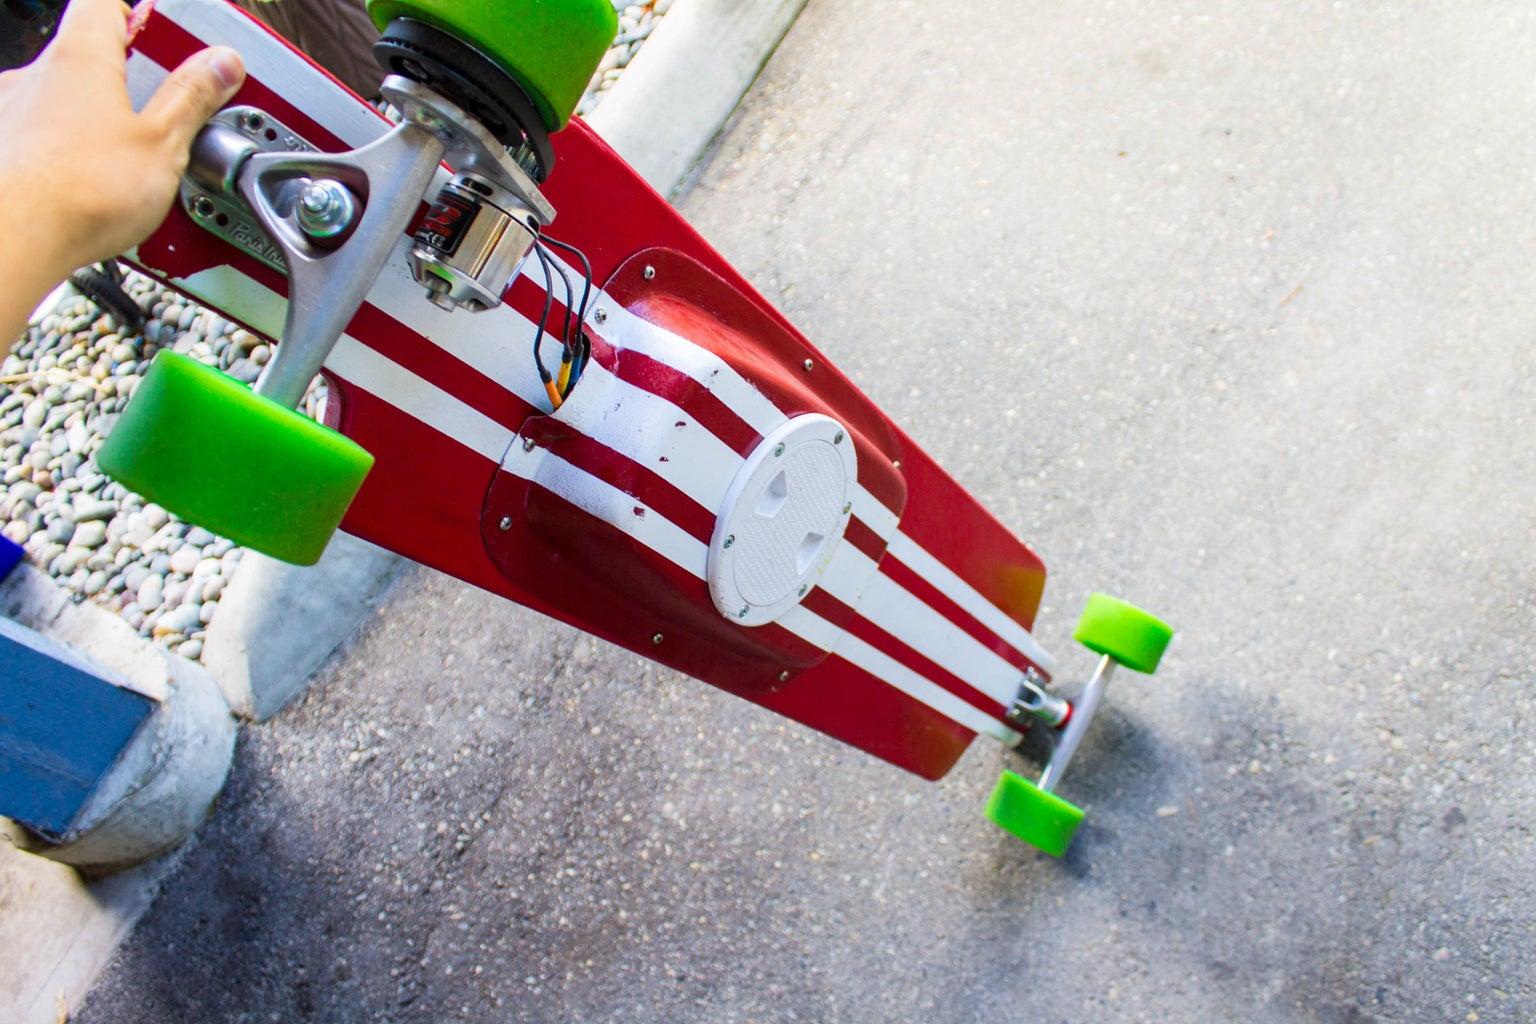 DIY Electric Longboard for $300